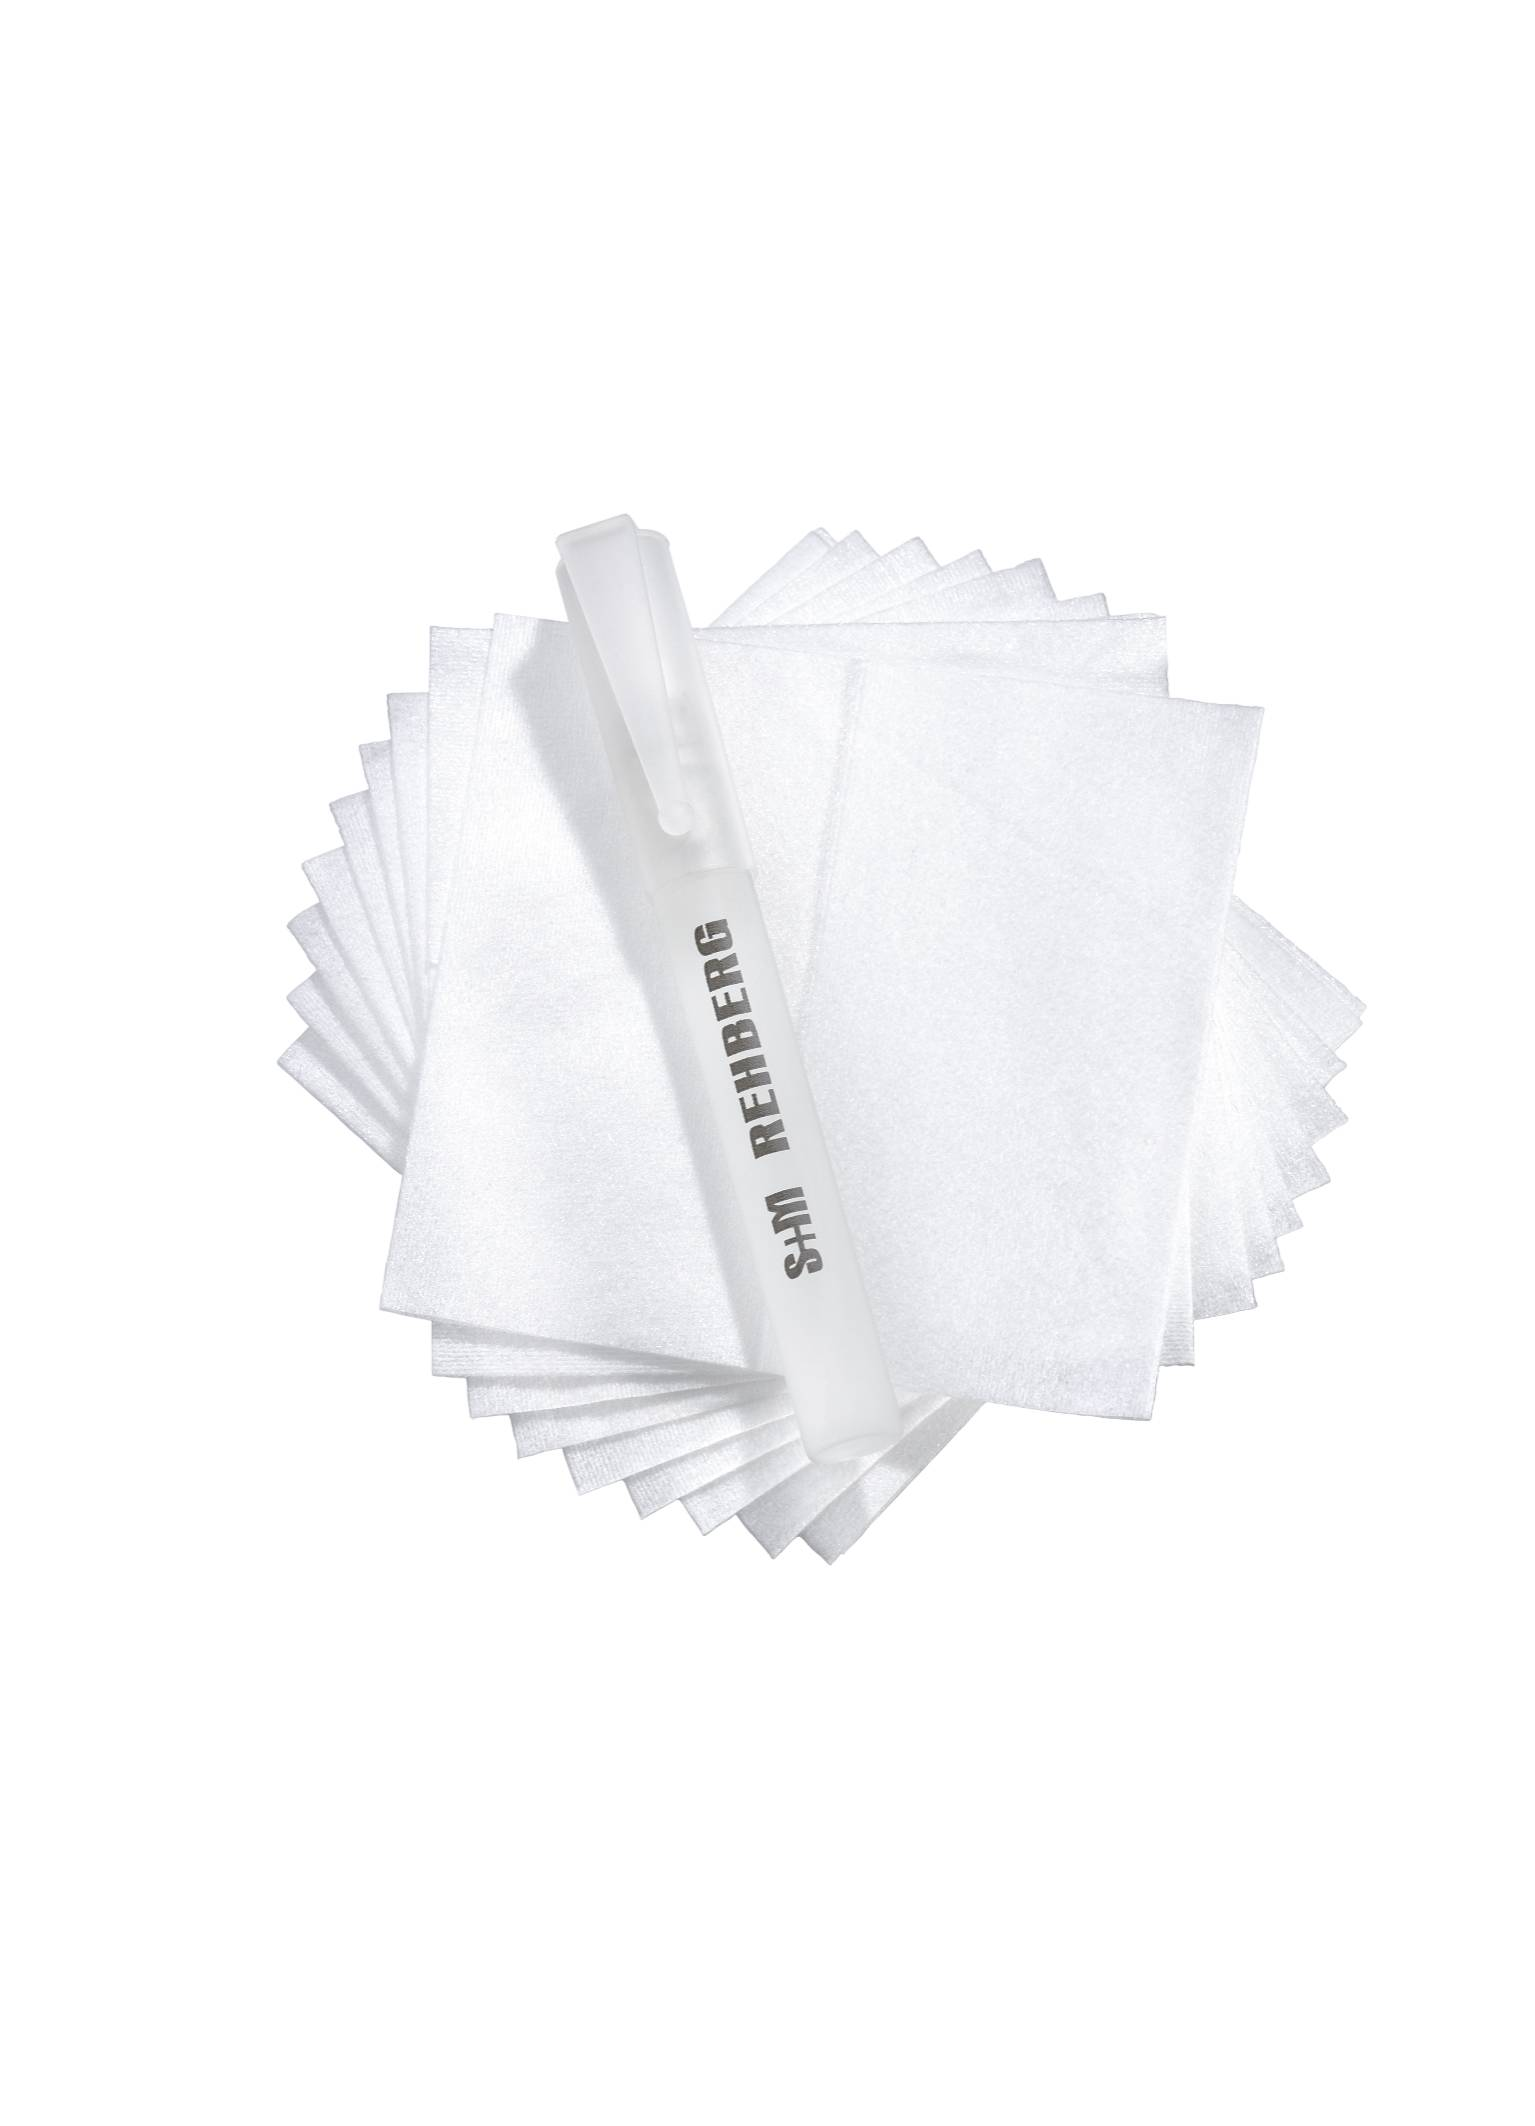 digiclean 10 reinigungstücher zerstäuber